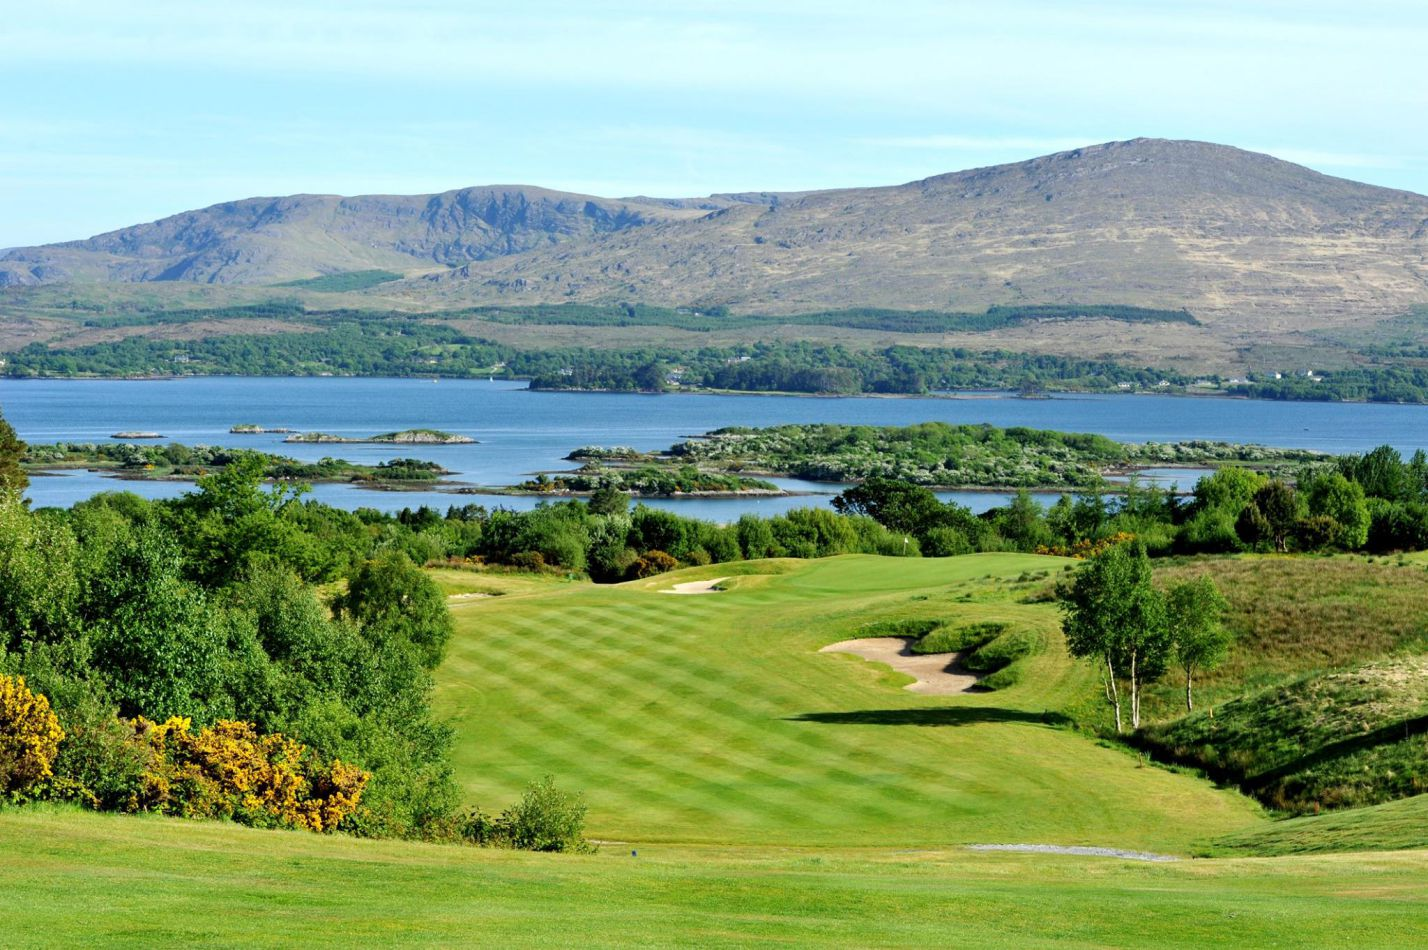 Ring of Kerry Golf Club